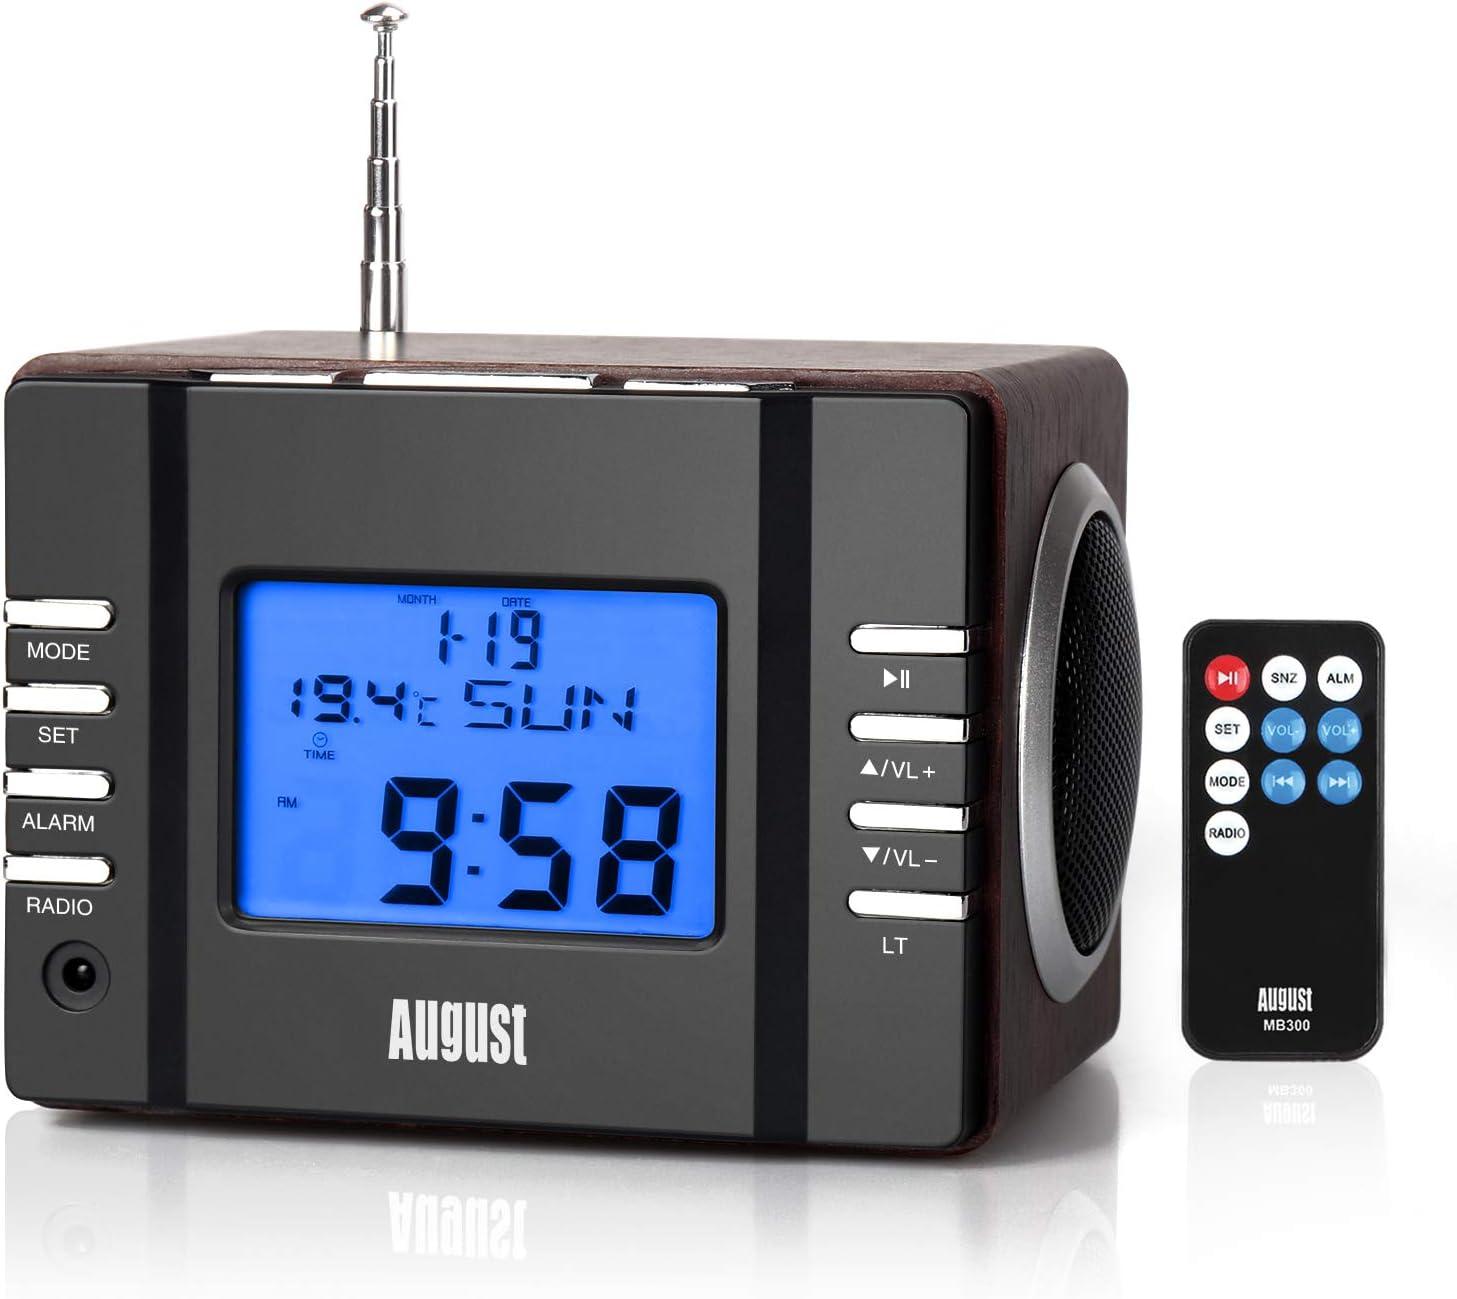 FM Radio Reloj Despertadores con Altavoz - August MB300 - Portátil Radio FM Puerto USB / Snooze / Temperatura / Sleep Timer / 12/24H Radiodespertadores para Dormitorio, Oficina - Telecomando